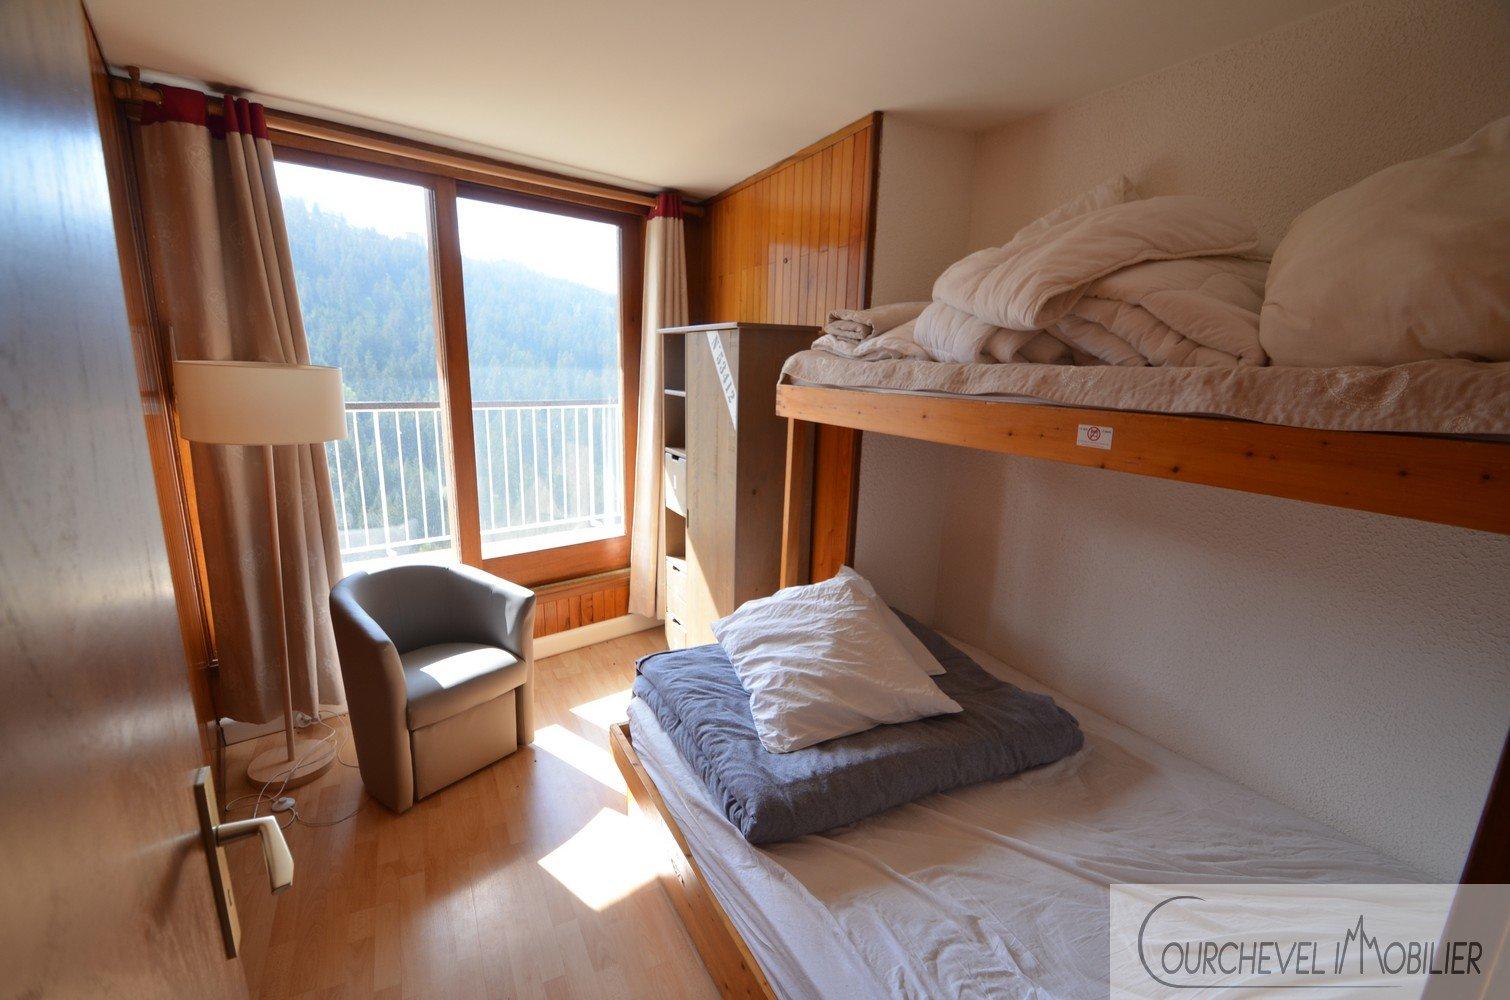 T2 apartment Season rental